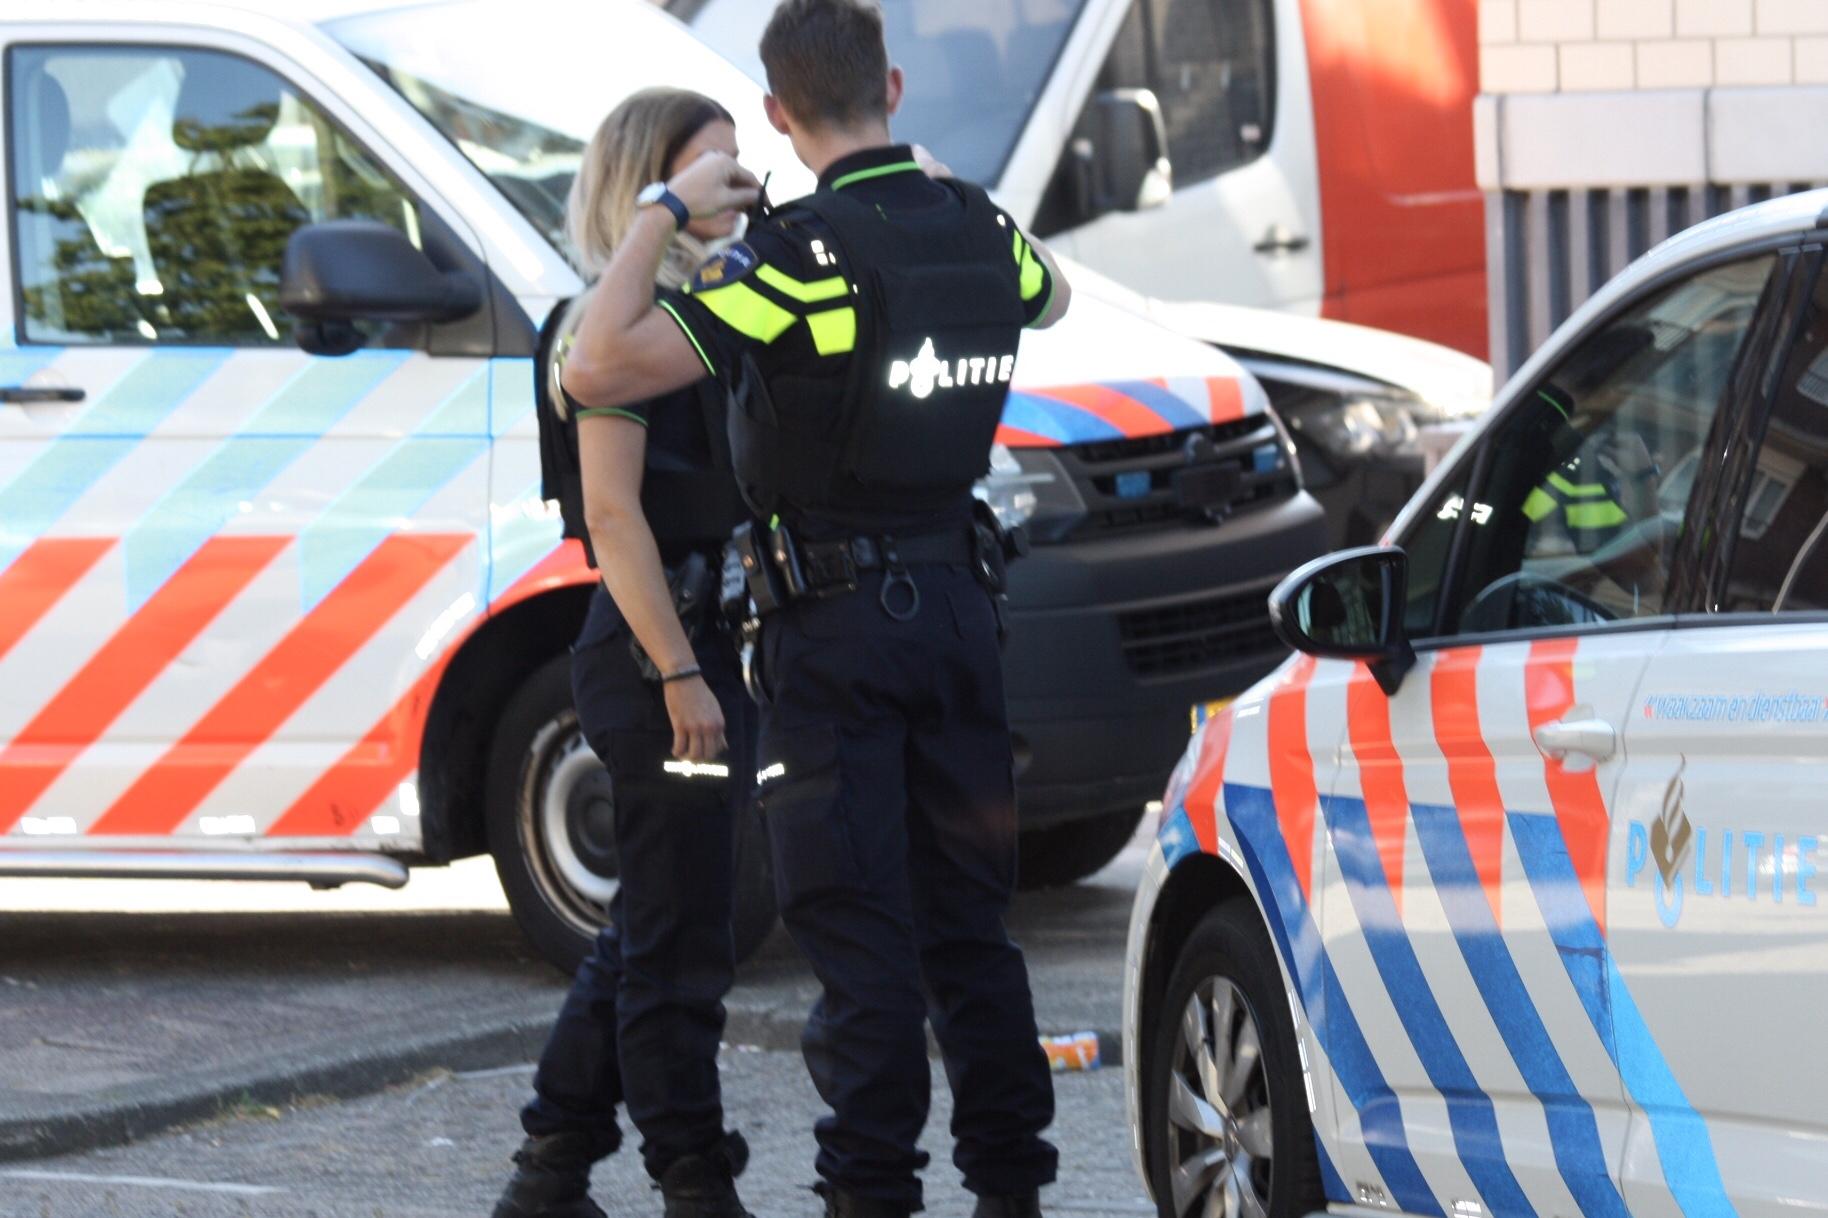 Gewapende overval Primera Maassluis, 1 persoon gewond geraakt